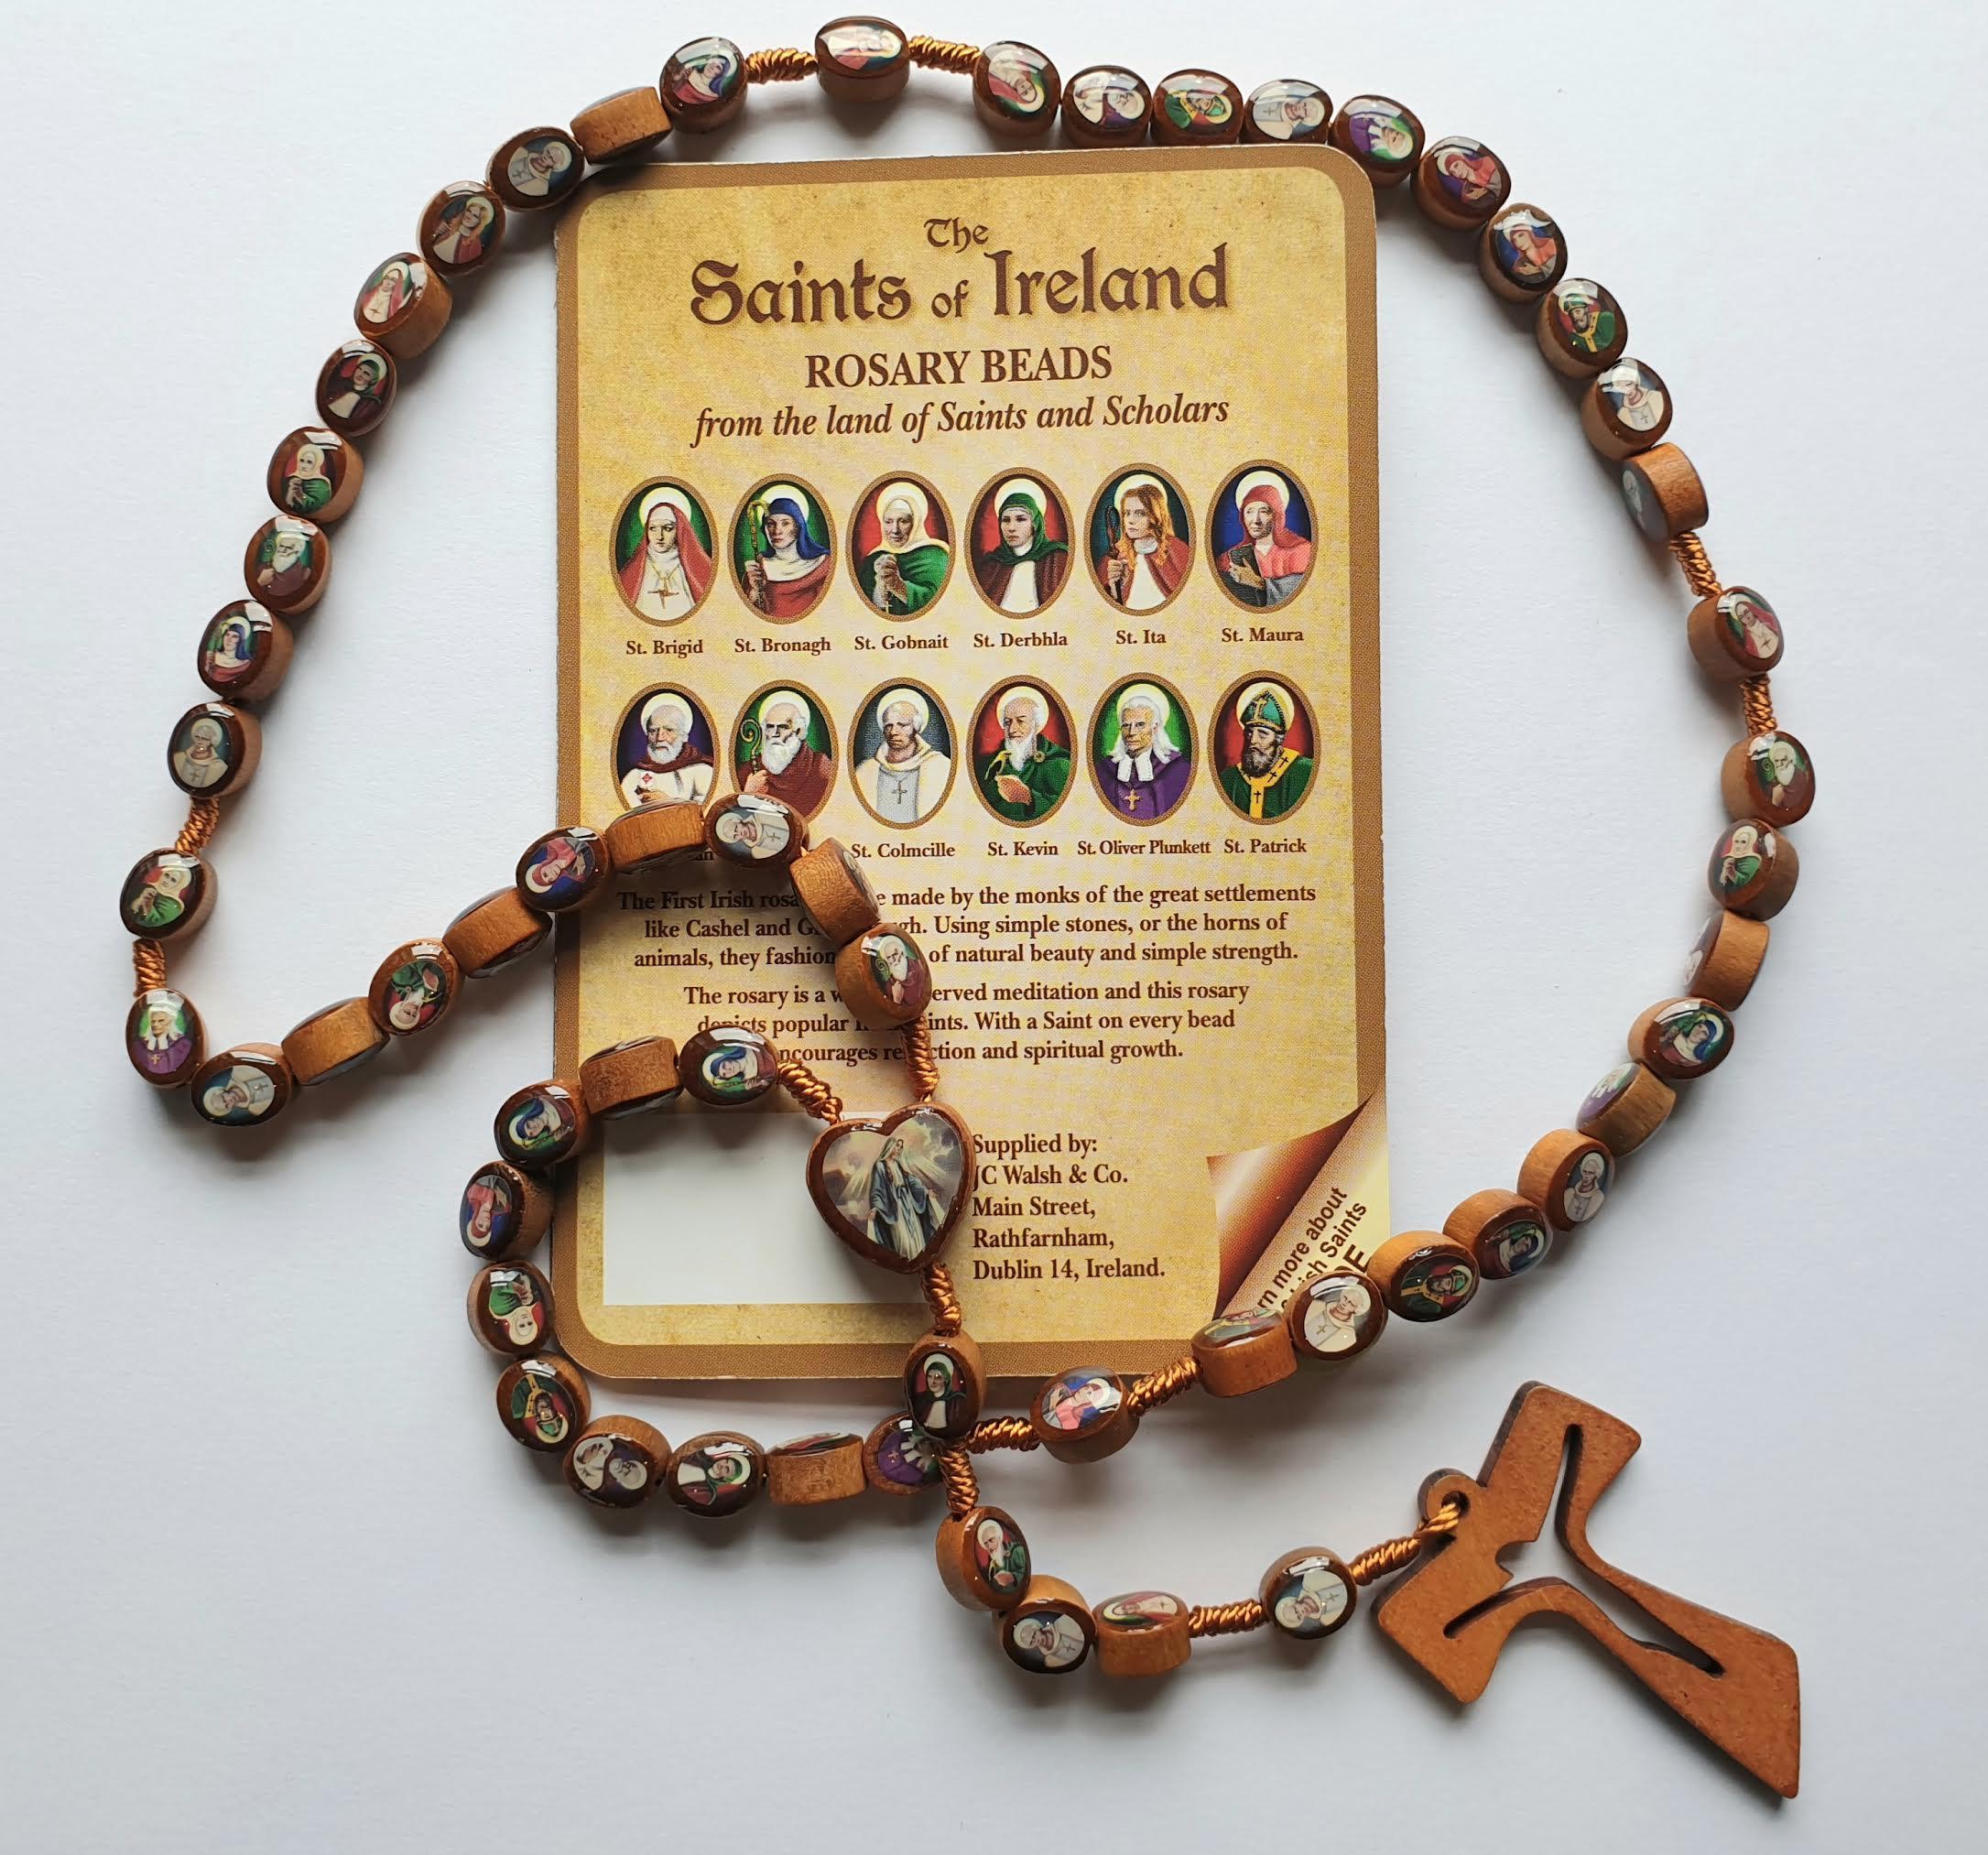 Saints of Ireland Rosary Beads